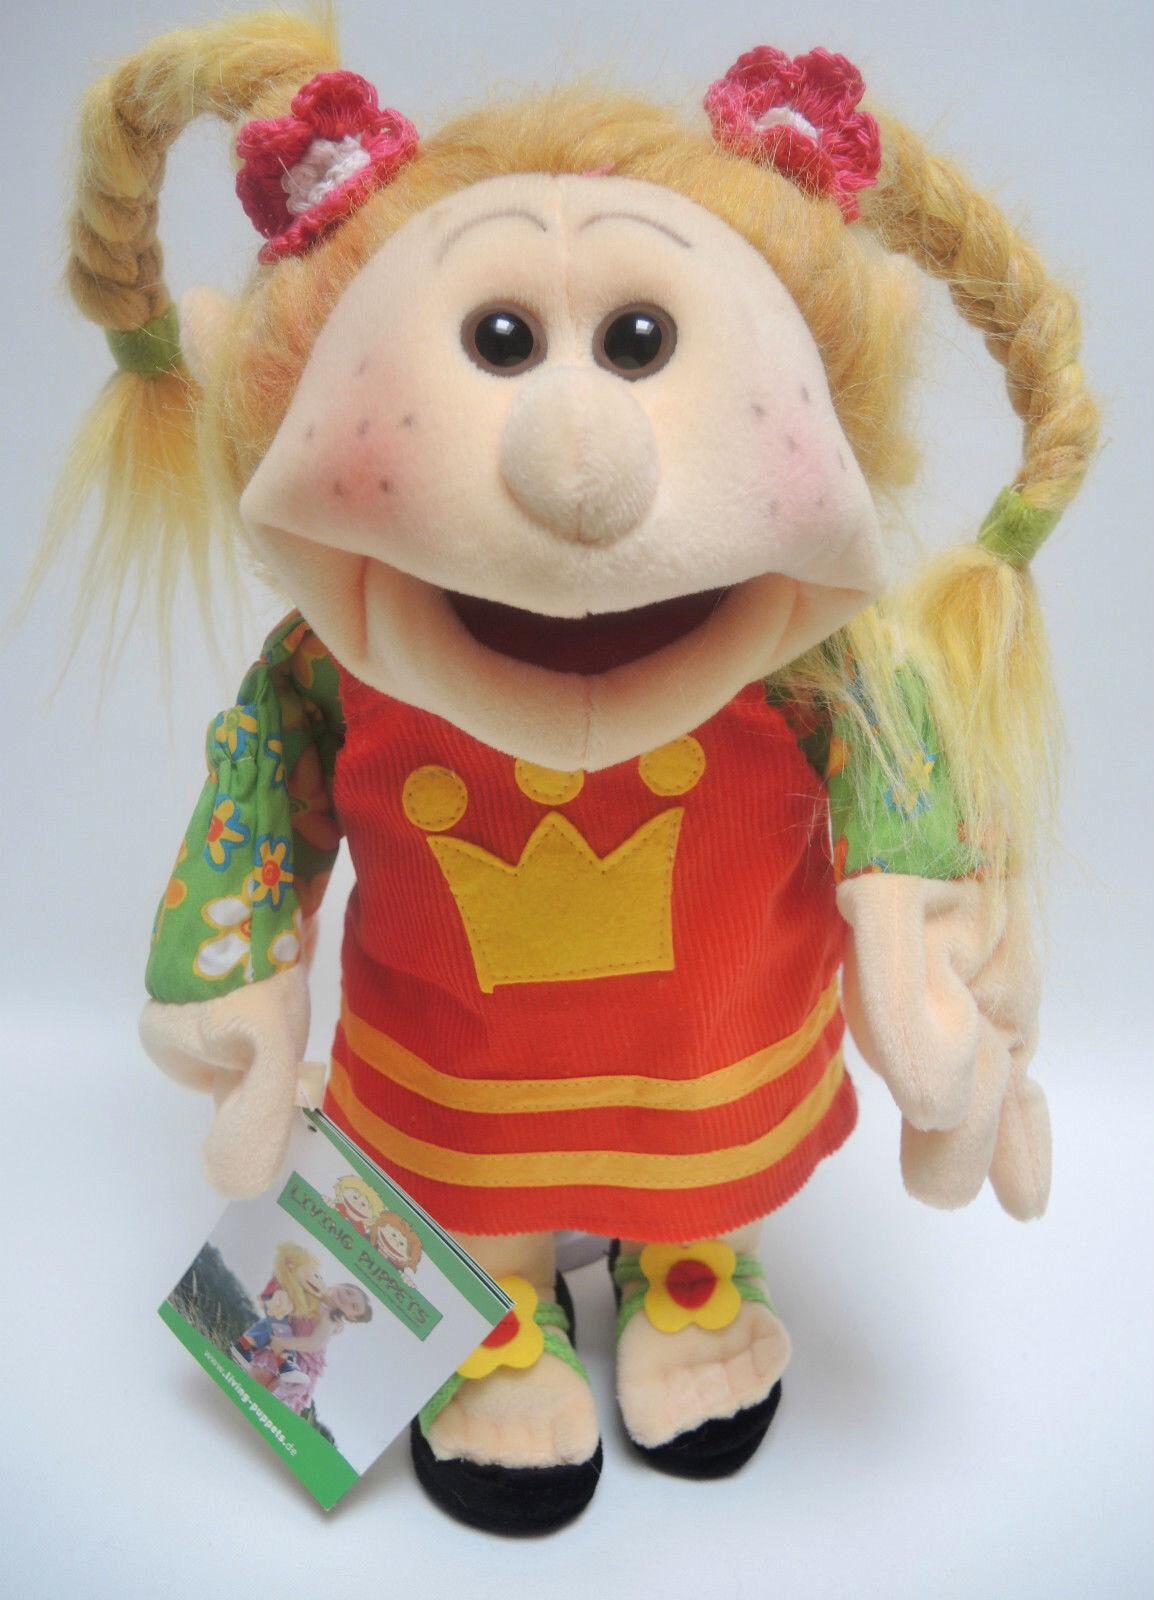 Living Puppets Handpuppe Jennylein Cm NEU Ca35 Ntsrgj3574